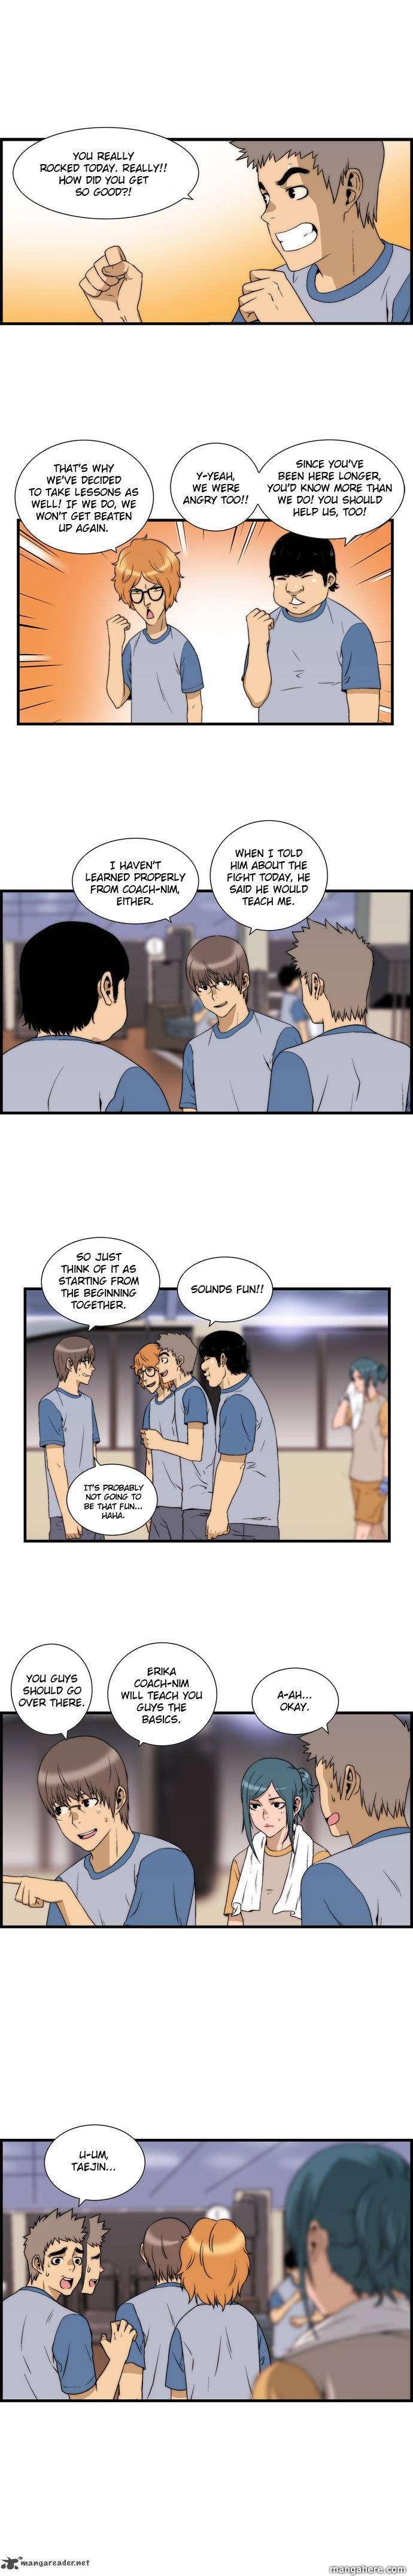 Green Boy 29 Page 5